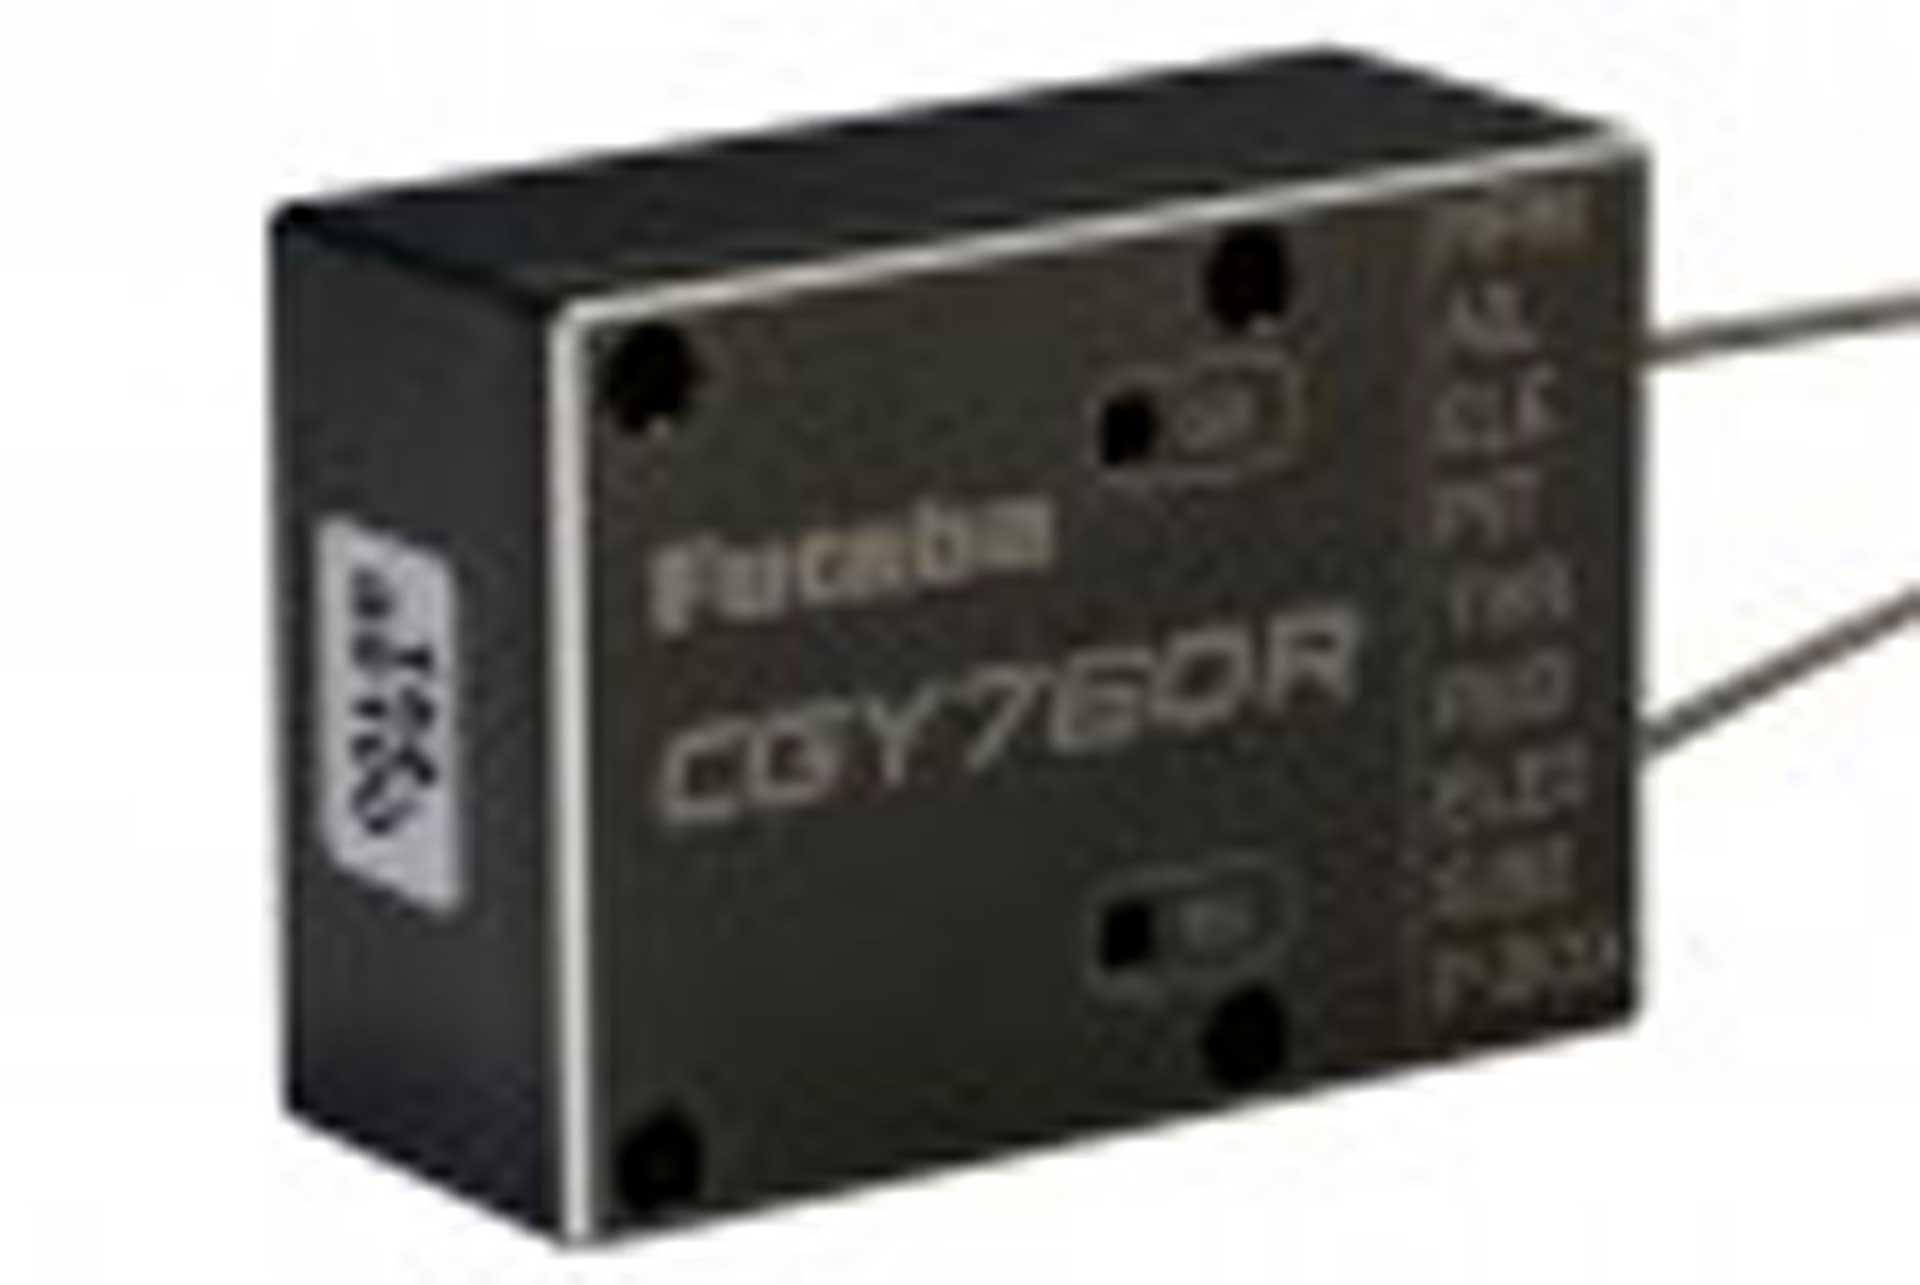 FUTABA CYG760R 3-AXIS GYRO WITH GPB-1 PROGRAM WITH PROGRAMMING BOX